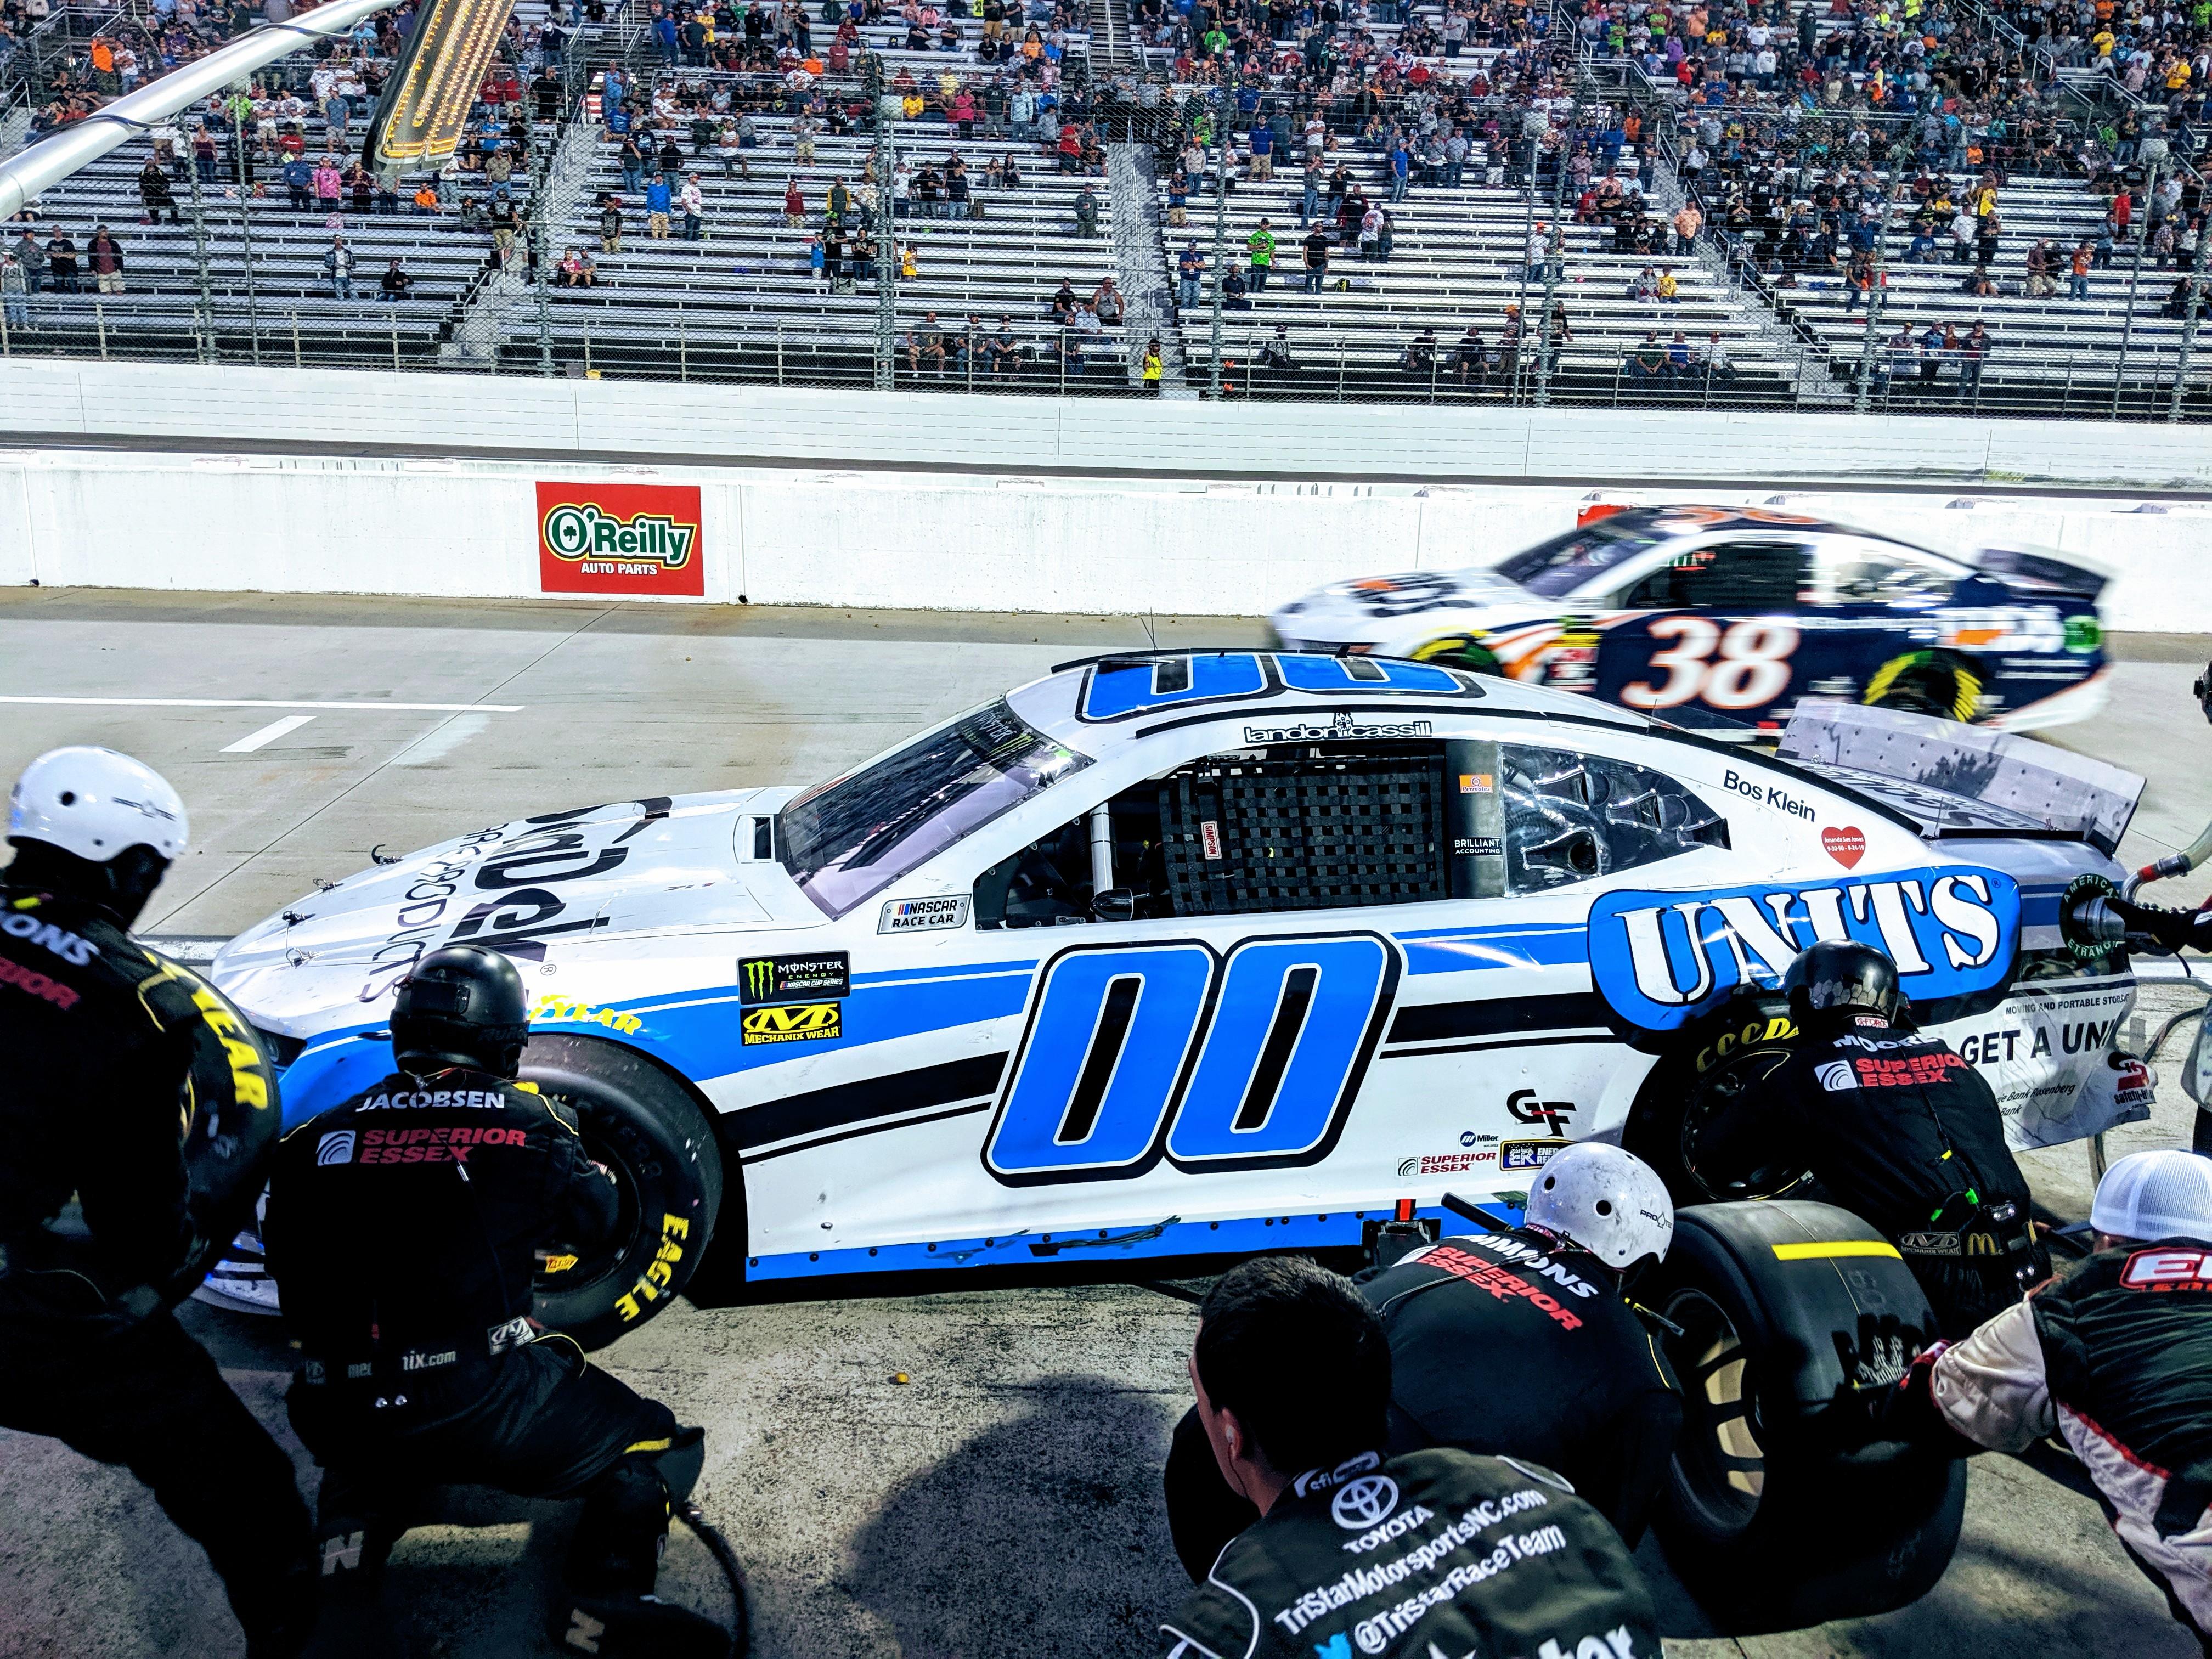 UNITS Moving & Portable Storage Announces NASCAR Sponsorship